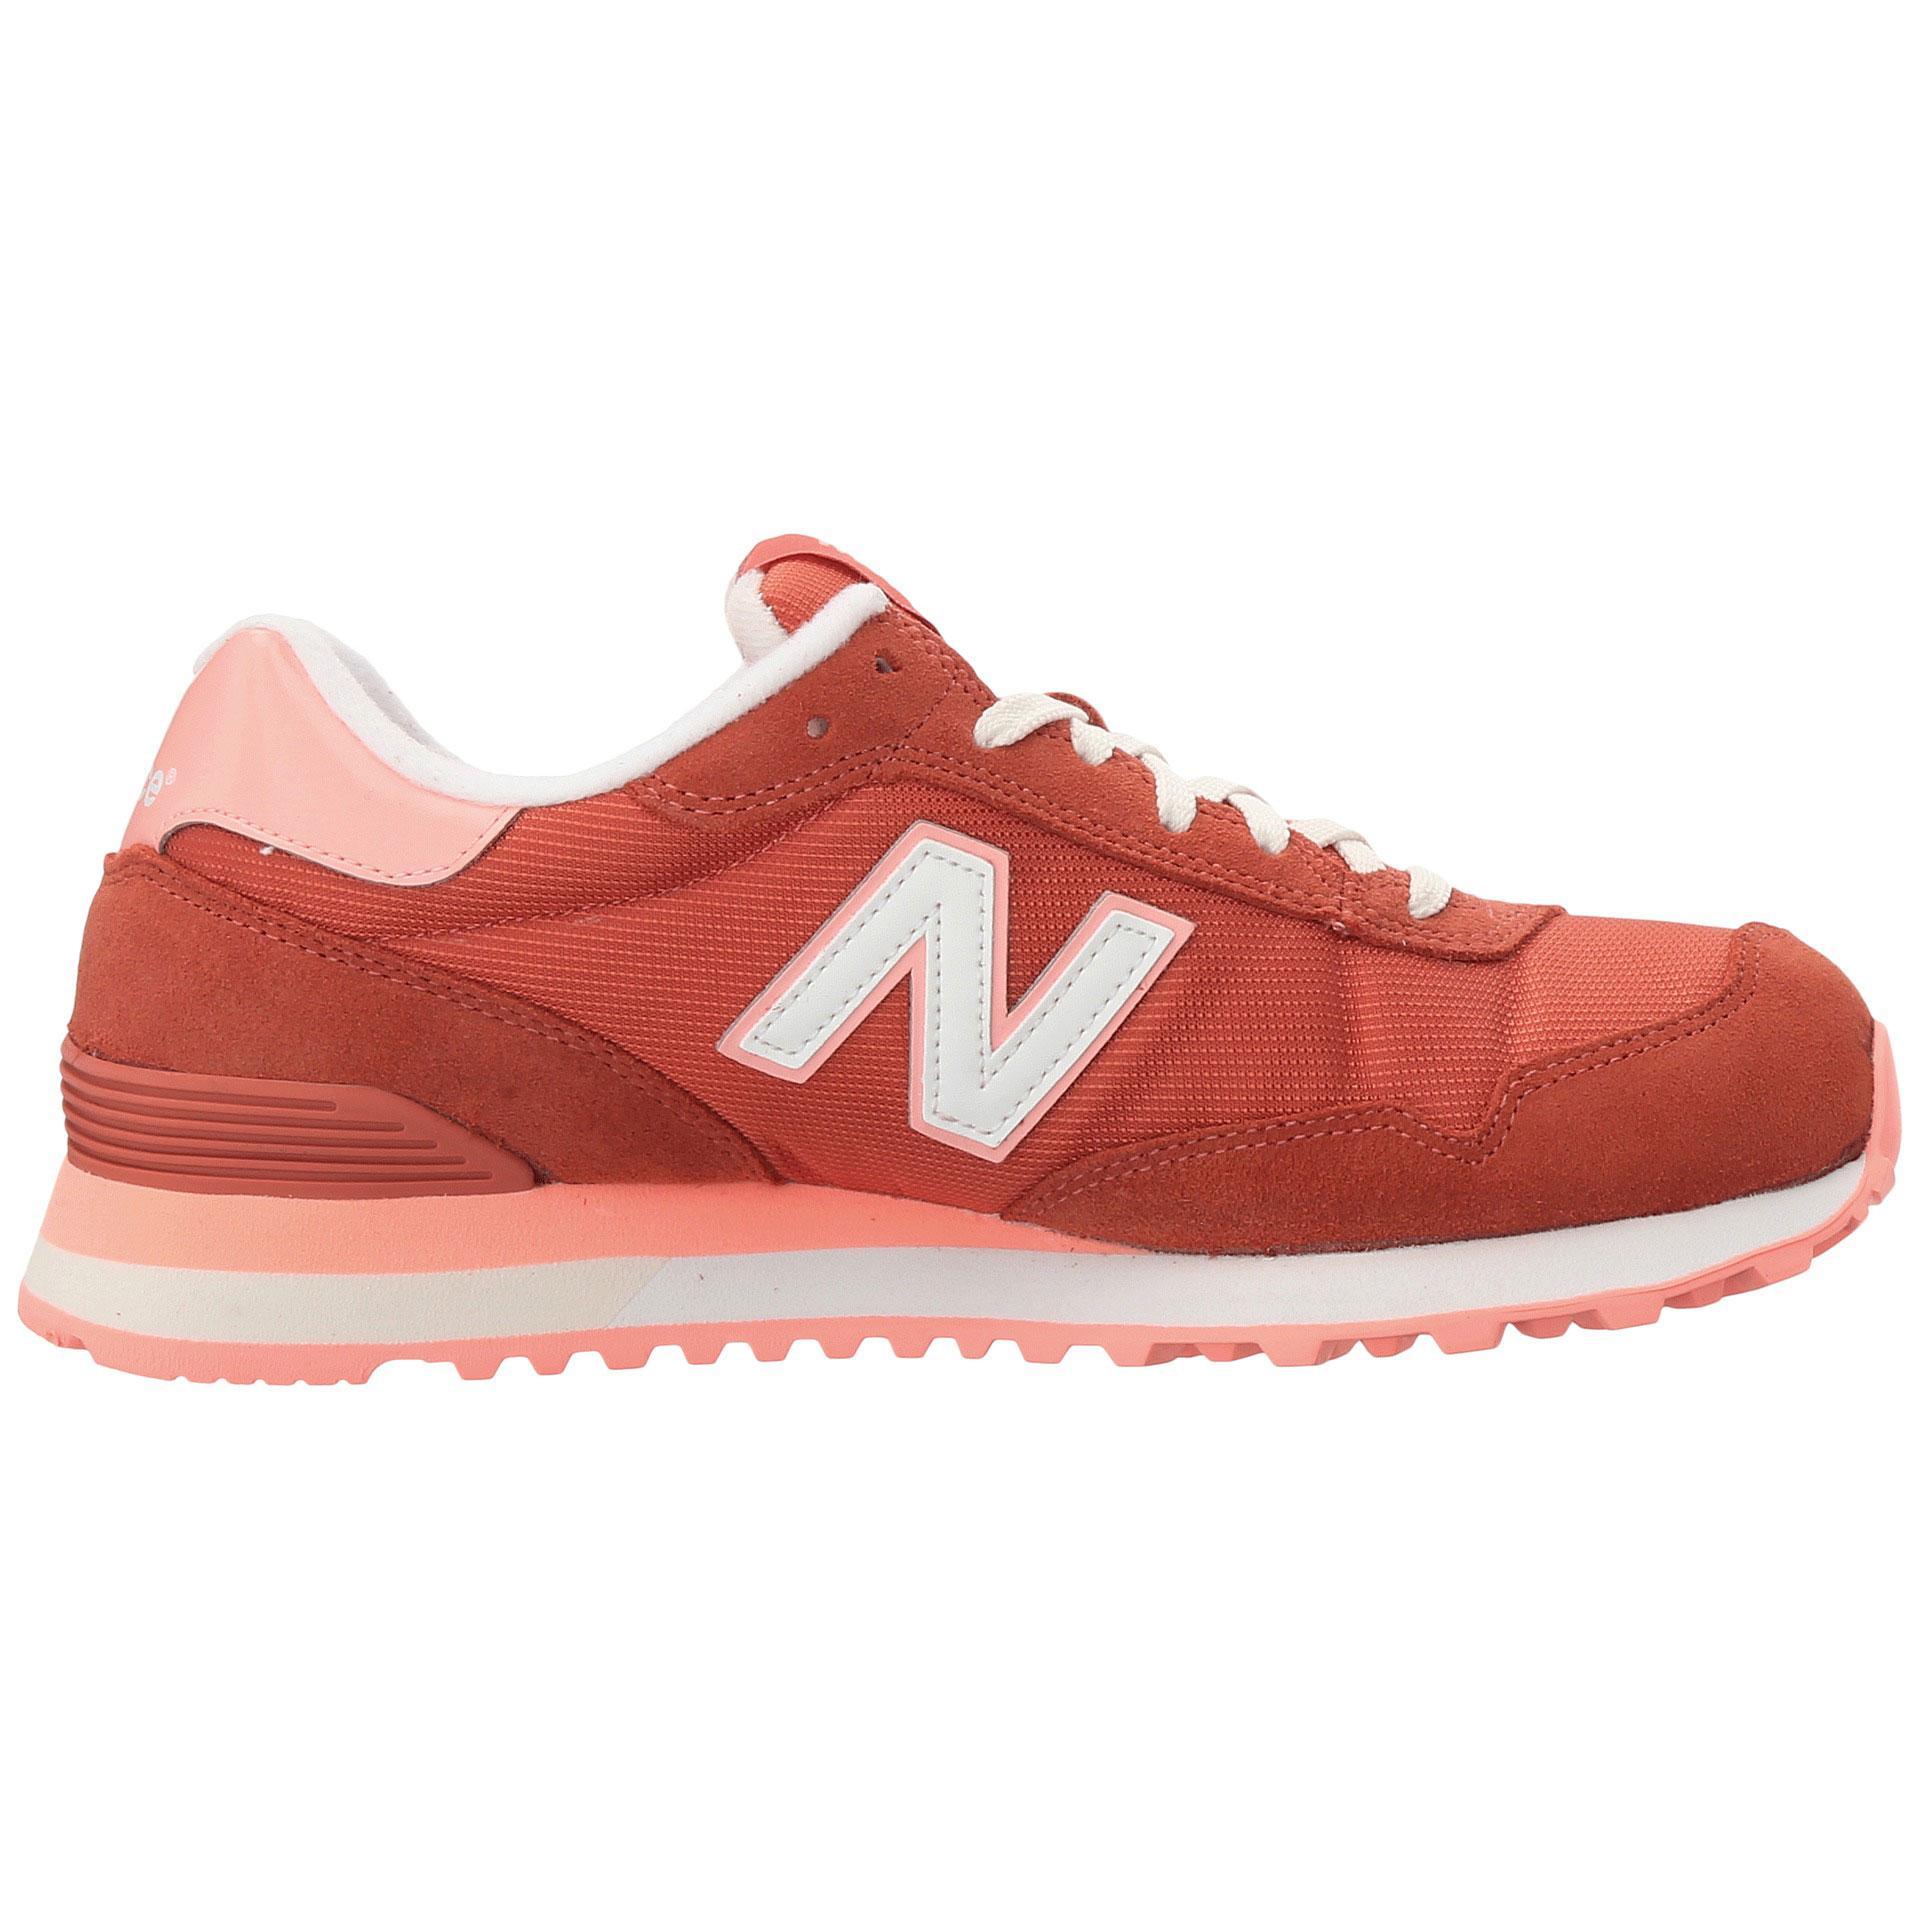 womens new balance shoes sale